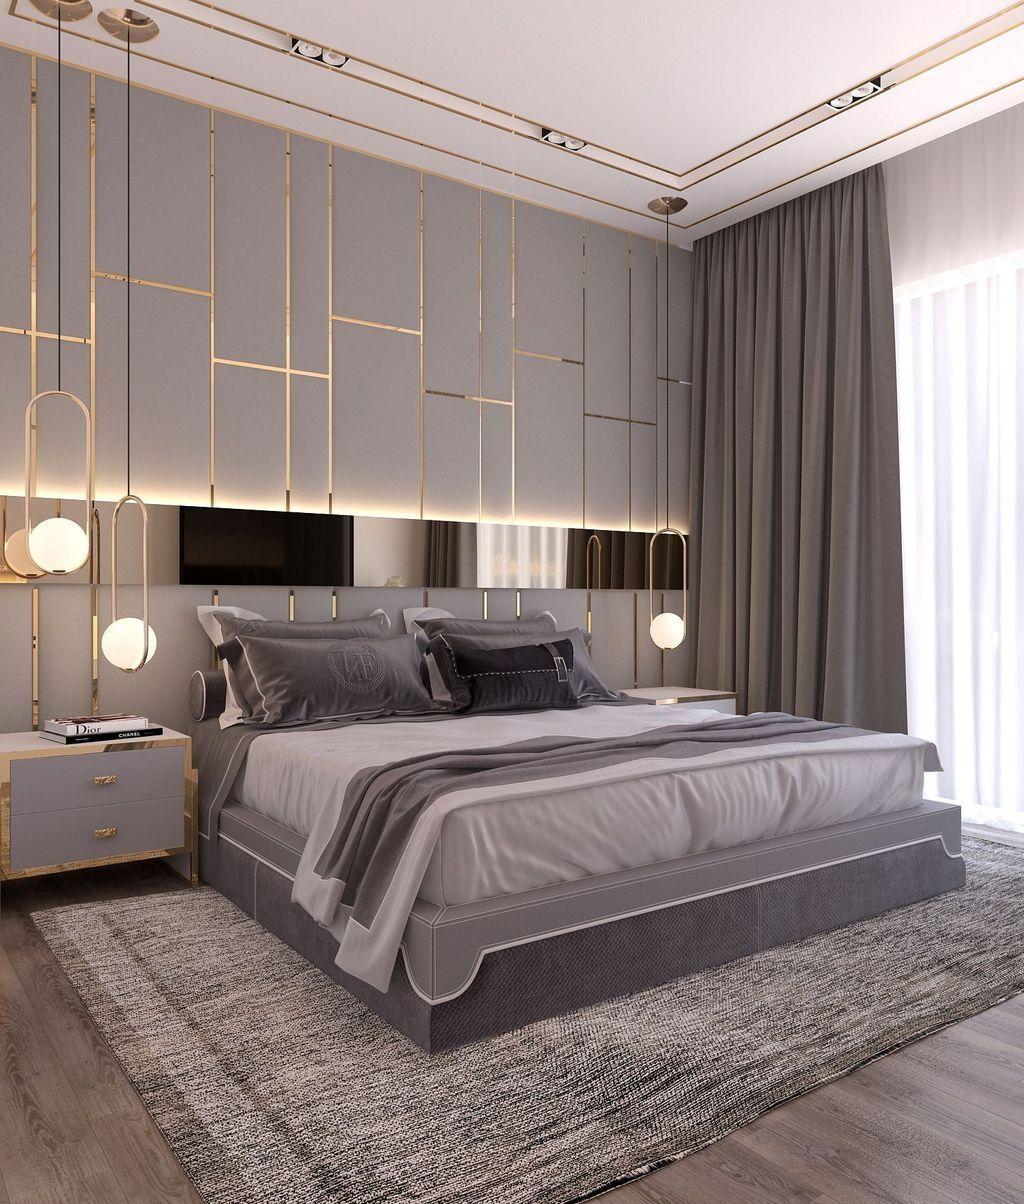 50 Gorgeous Modern Bedroom Decor Ideas Modernluxurybedroomdesign Simple Bedroom Design Luxury Bedroom Master Modern Style Bedroom Gorgeous transitional style bedroom